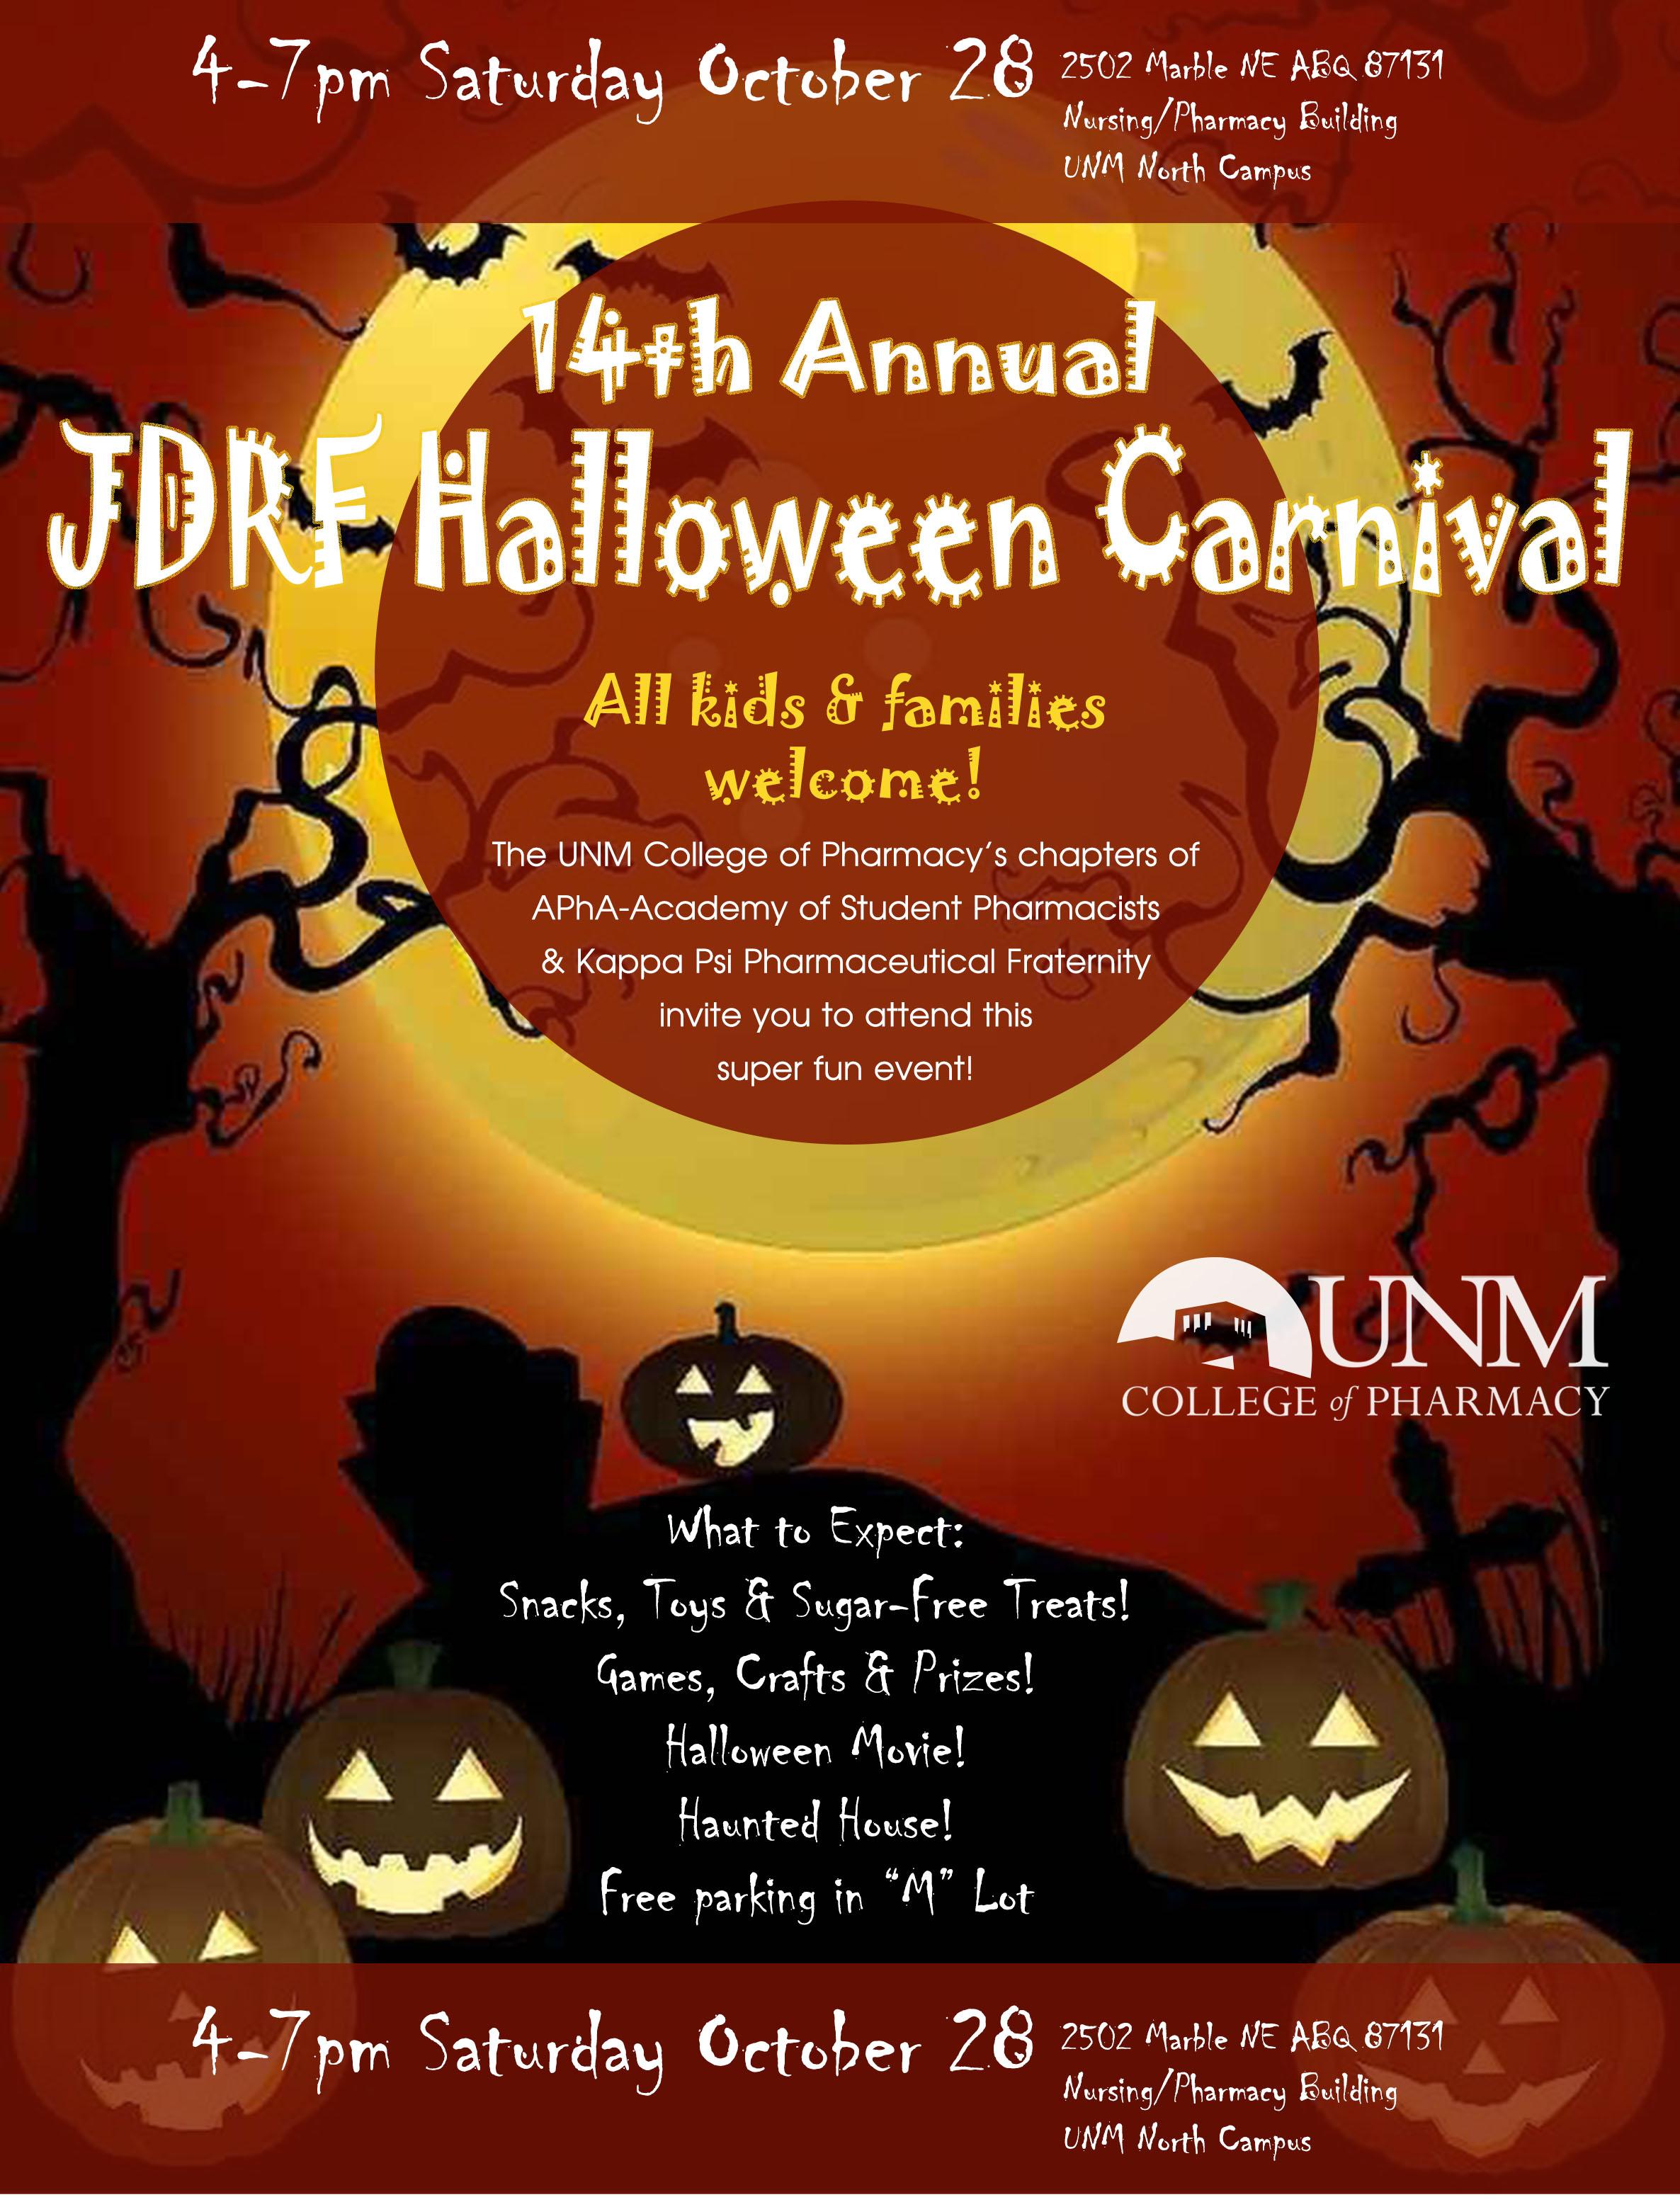 unm events calendar - 14th annual jdrf halloween carnival